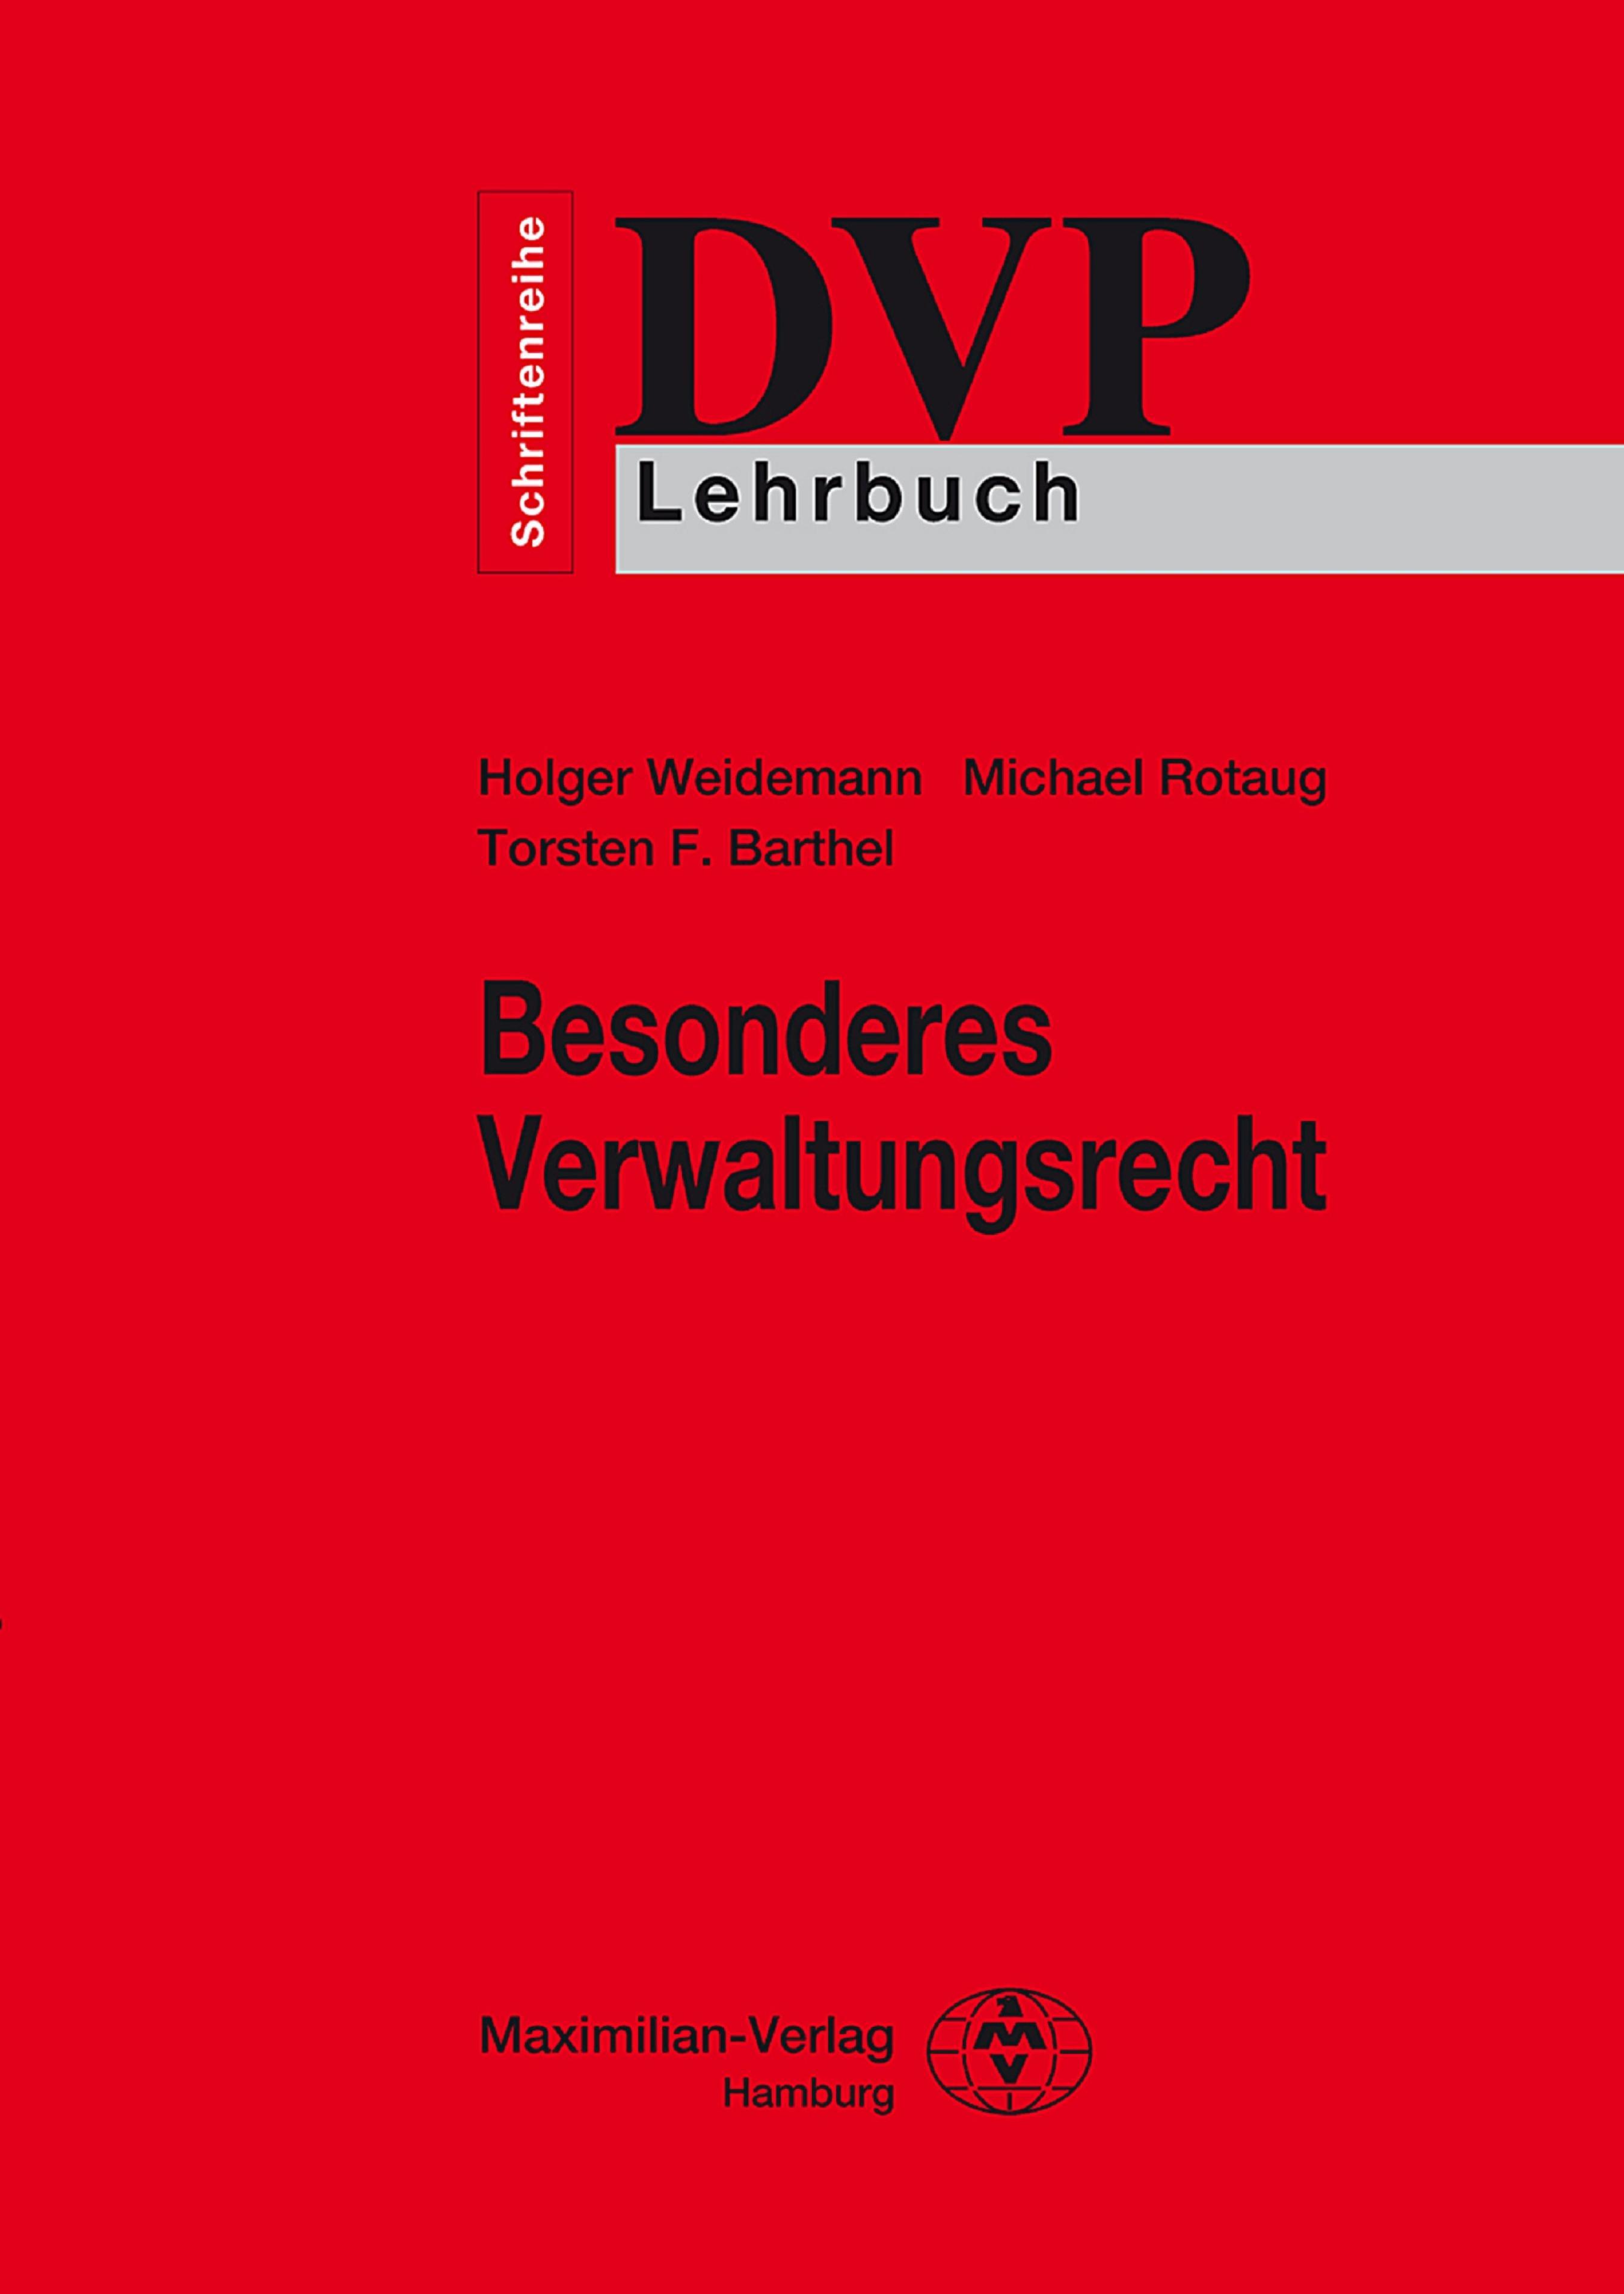 Holger Weidemann Besonderes Verwaltungsrecht